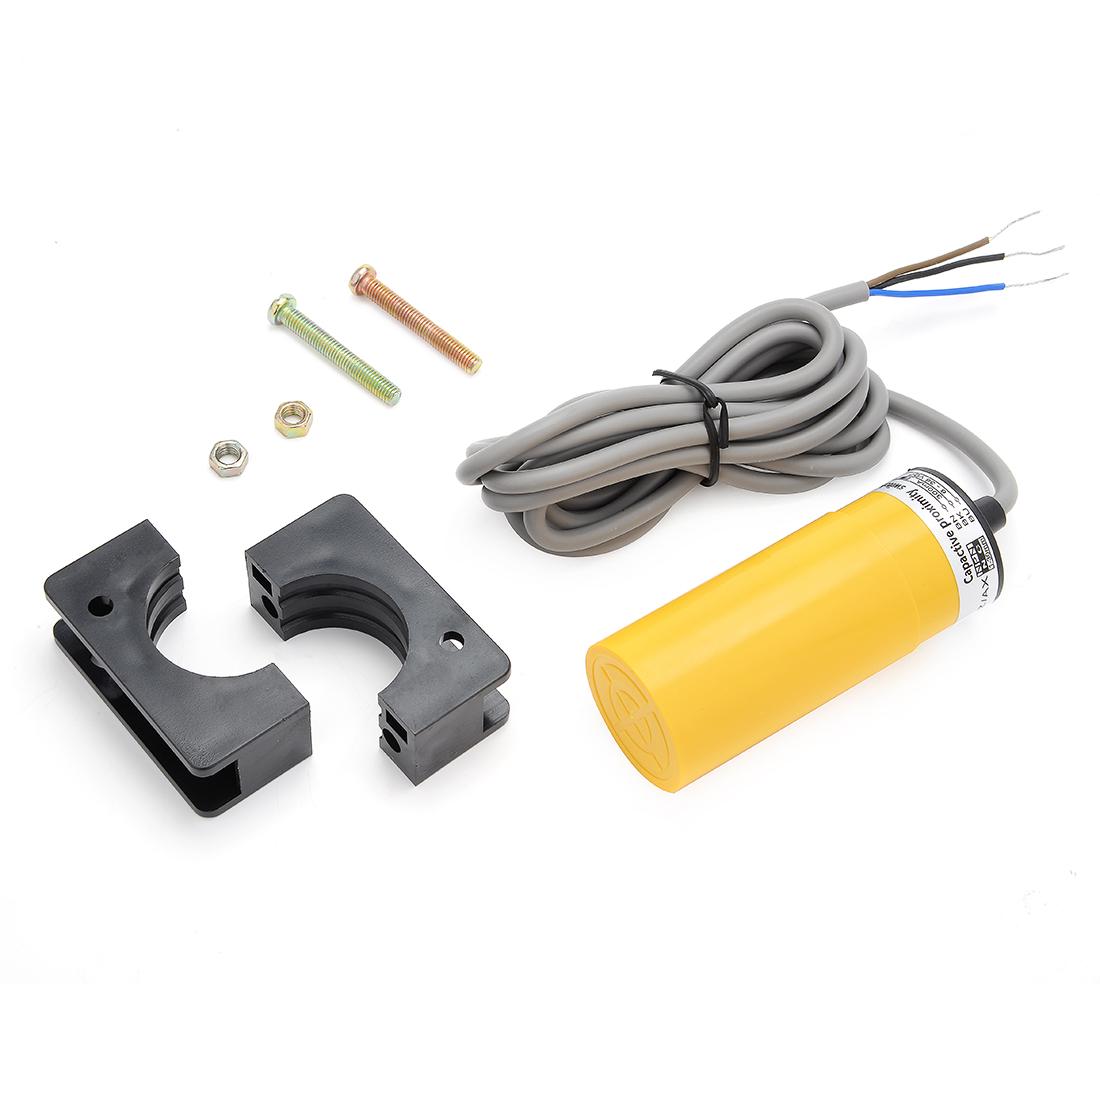 LJC34A4-K-Z/AX 1-30mm Capacitance Proximity Sensor Switch NPN NC DC 6-36V 300mA